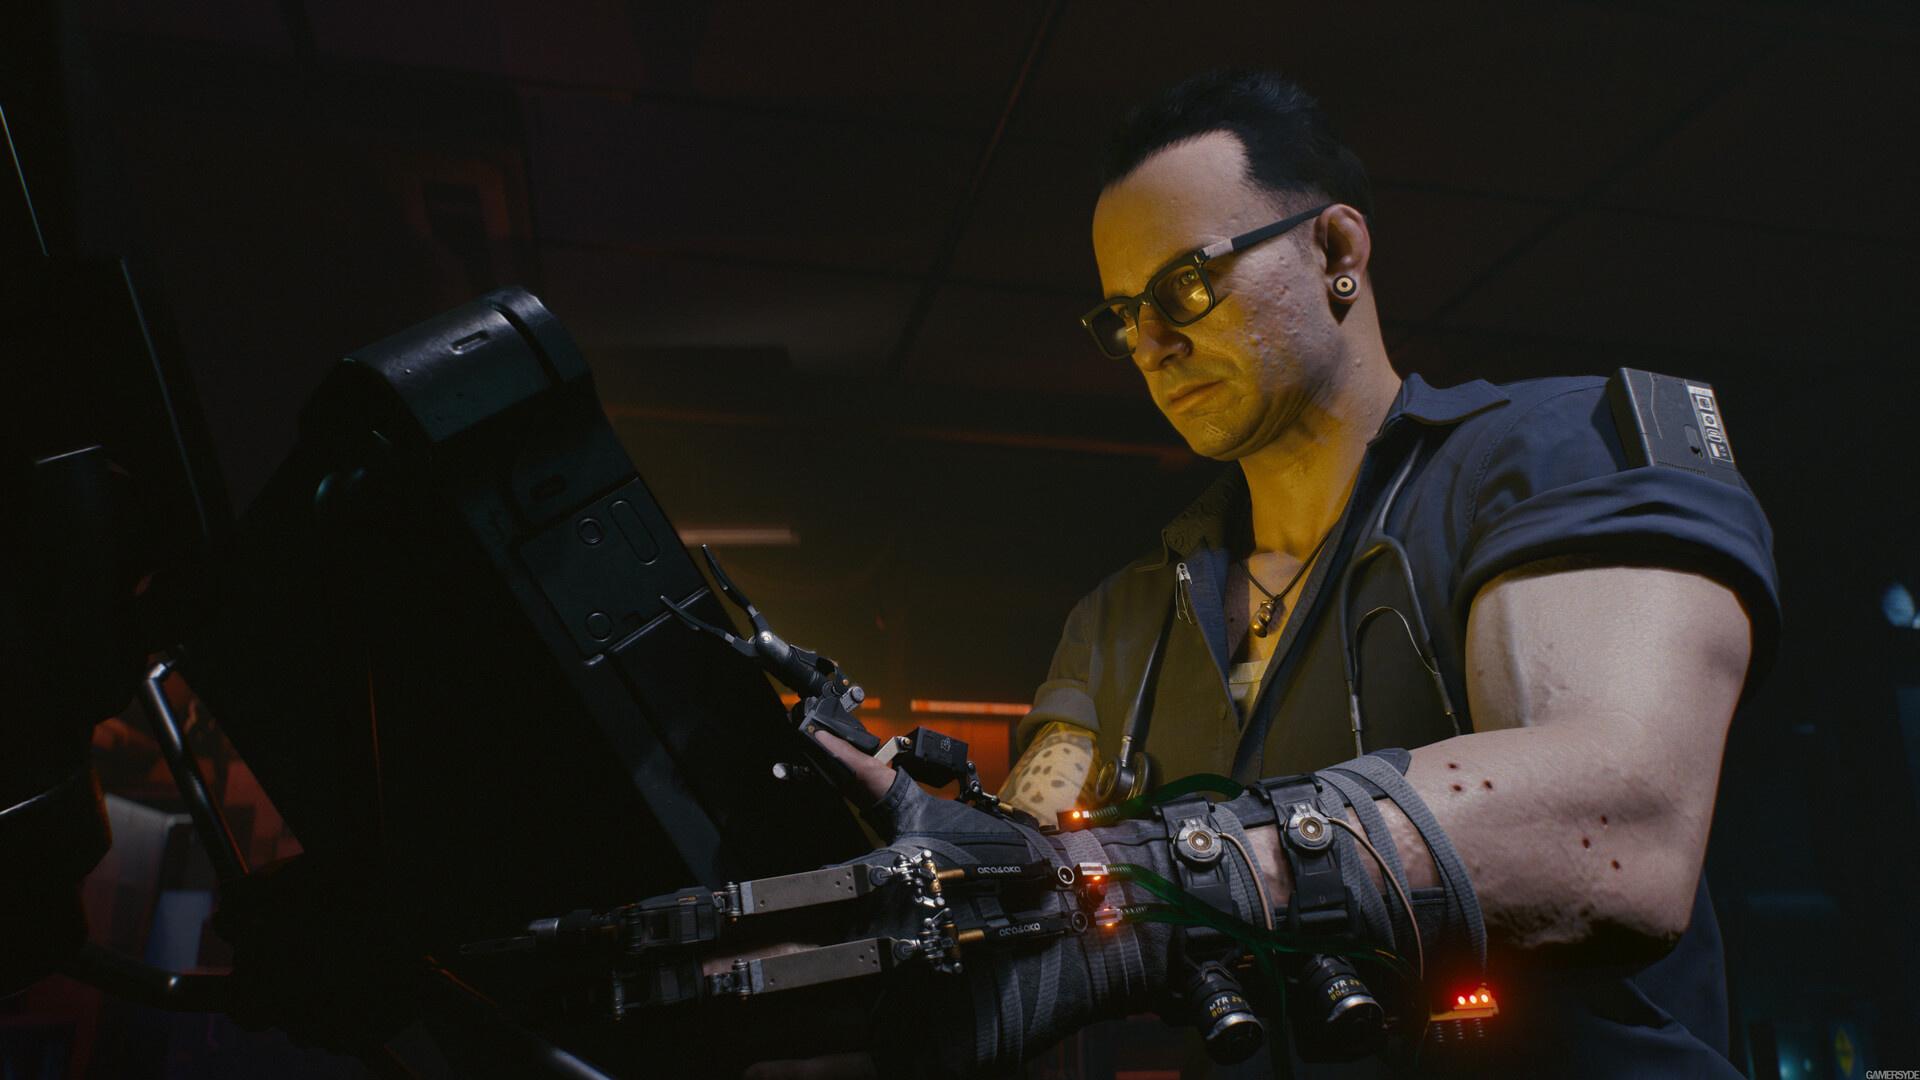 Cyberpunk 2077 опустилась на3 место в рознице Британии. Лидер — «Вальгалла»